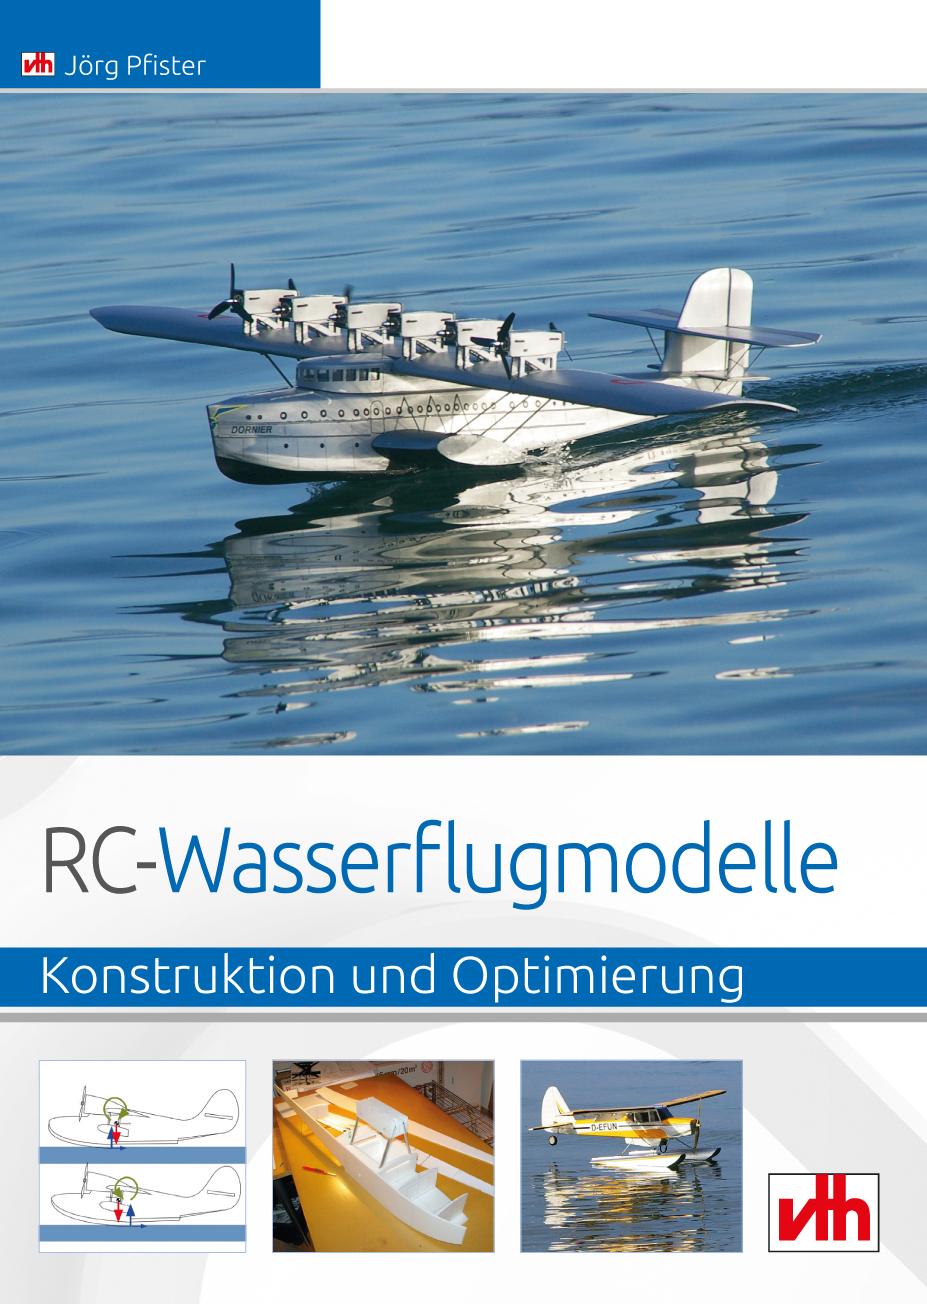 RC-Wasserflugmodelle-Joerg-Pfister